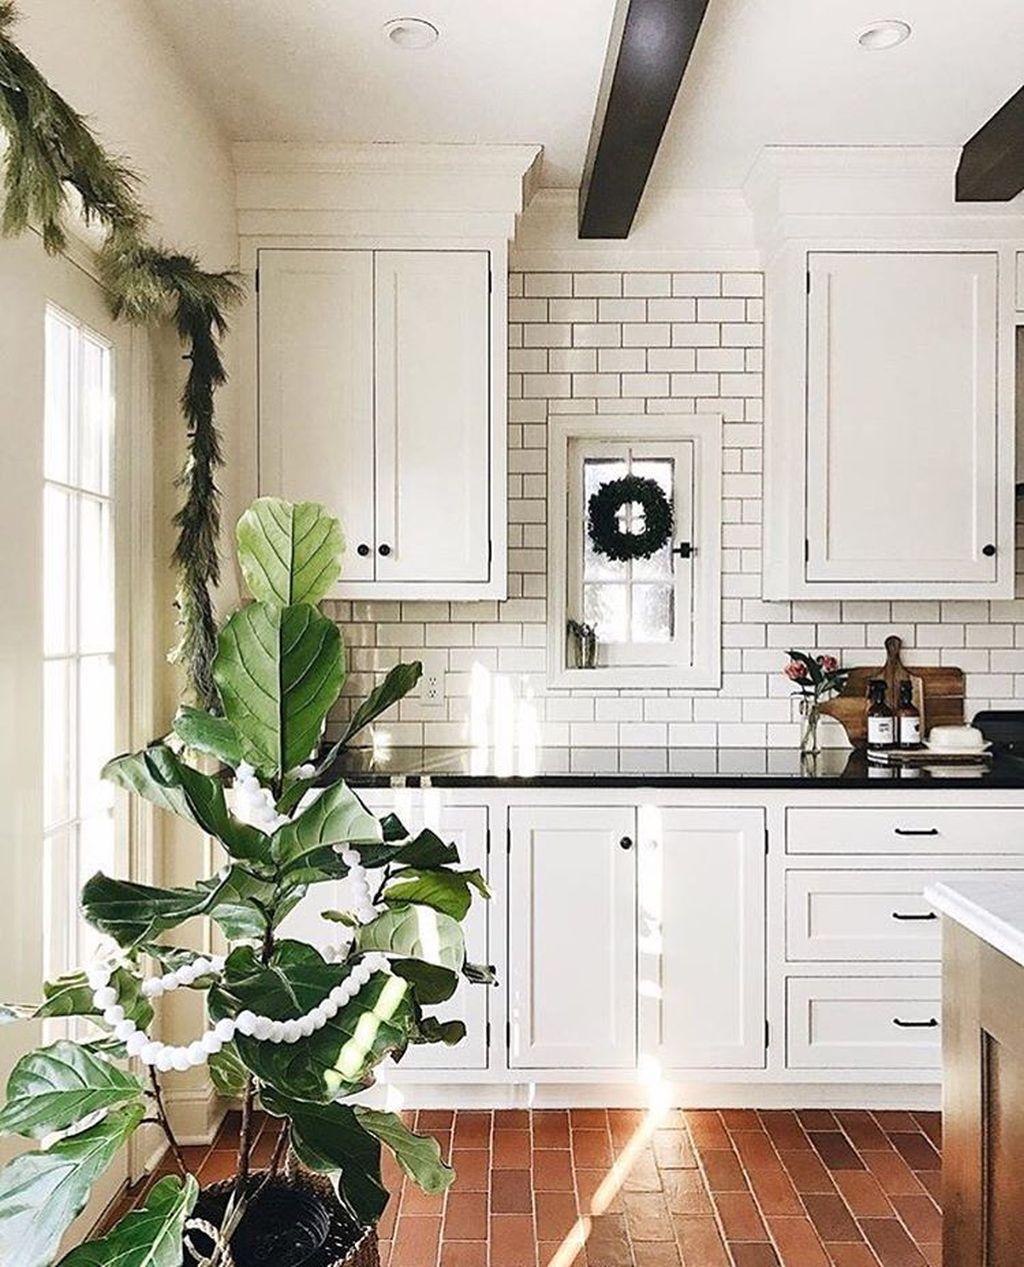 25 brick floor kitchen ideas in 2020 brick floor kitchen kitchen inspiration design kitchen on farmhouse kitchen tile floor id=62898